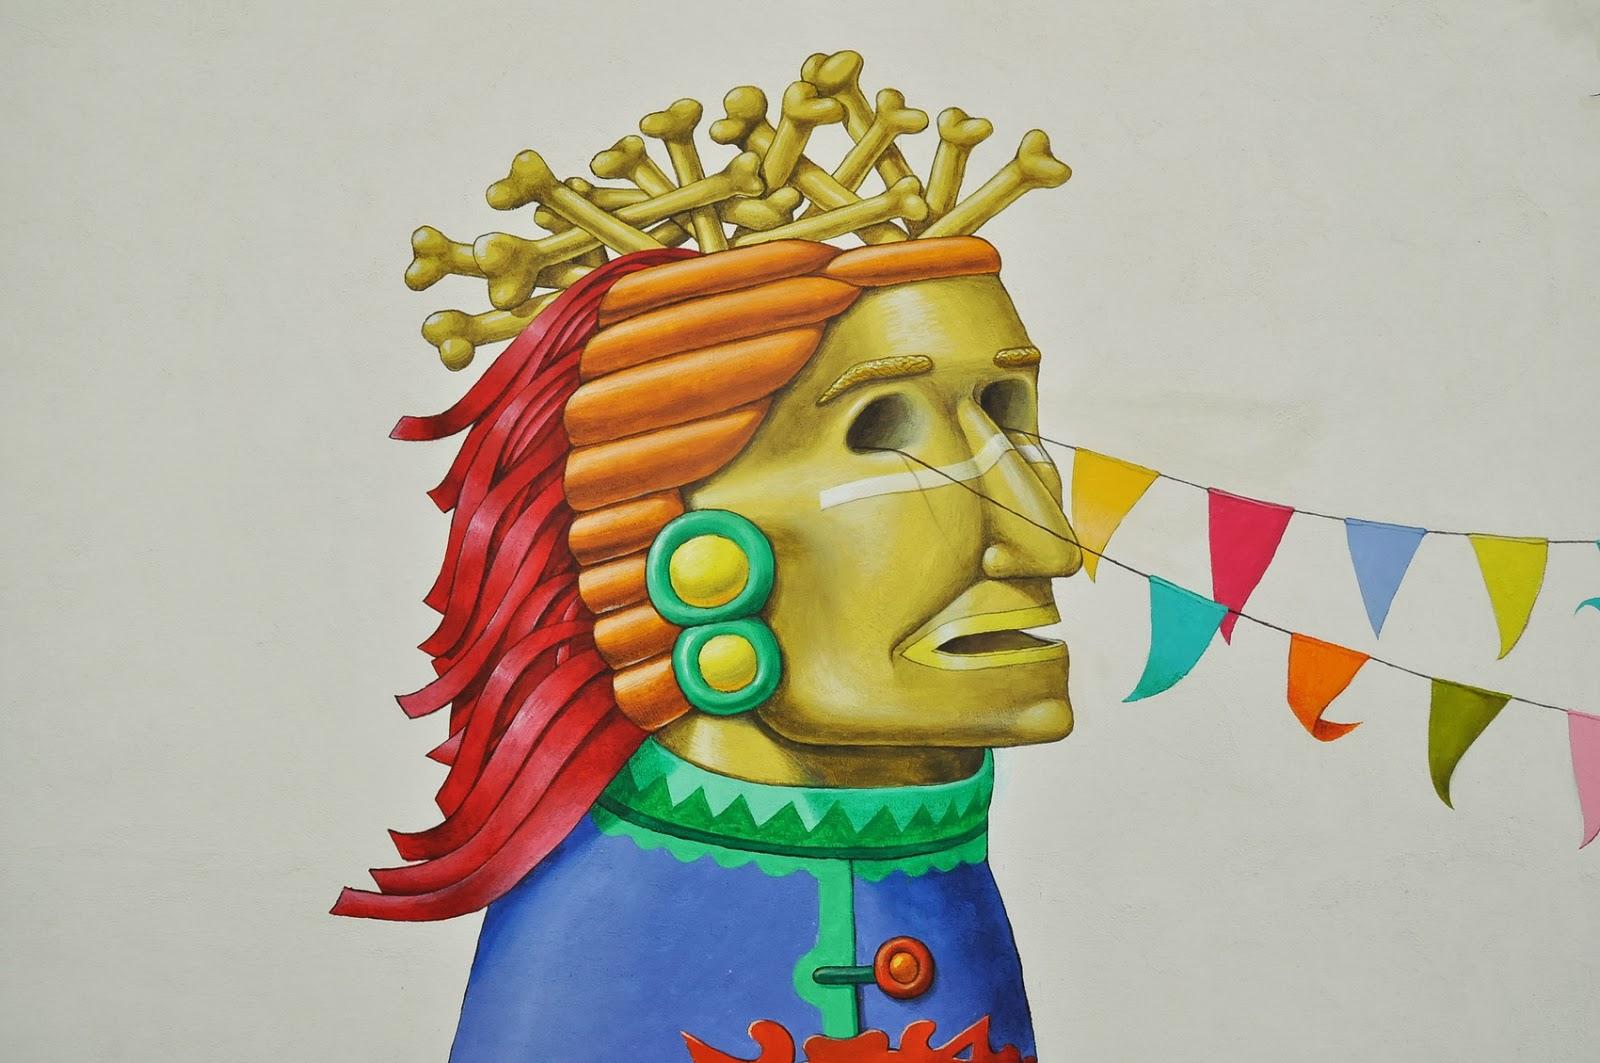 interesni-kazki-new-mural-campeche-mexico-14